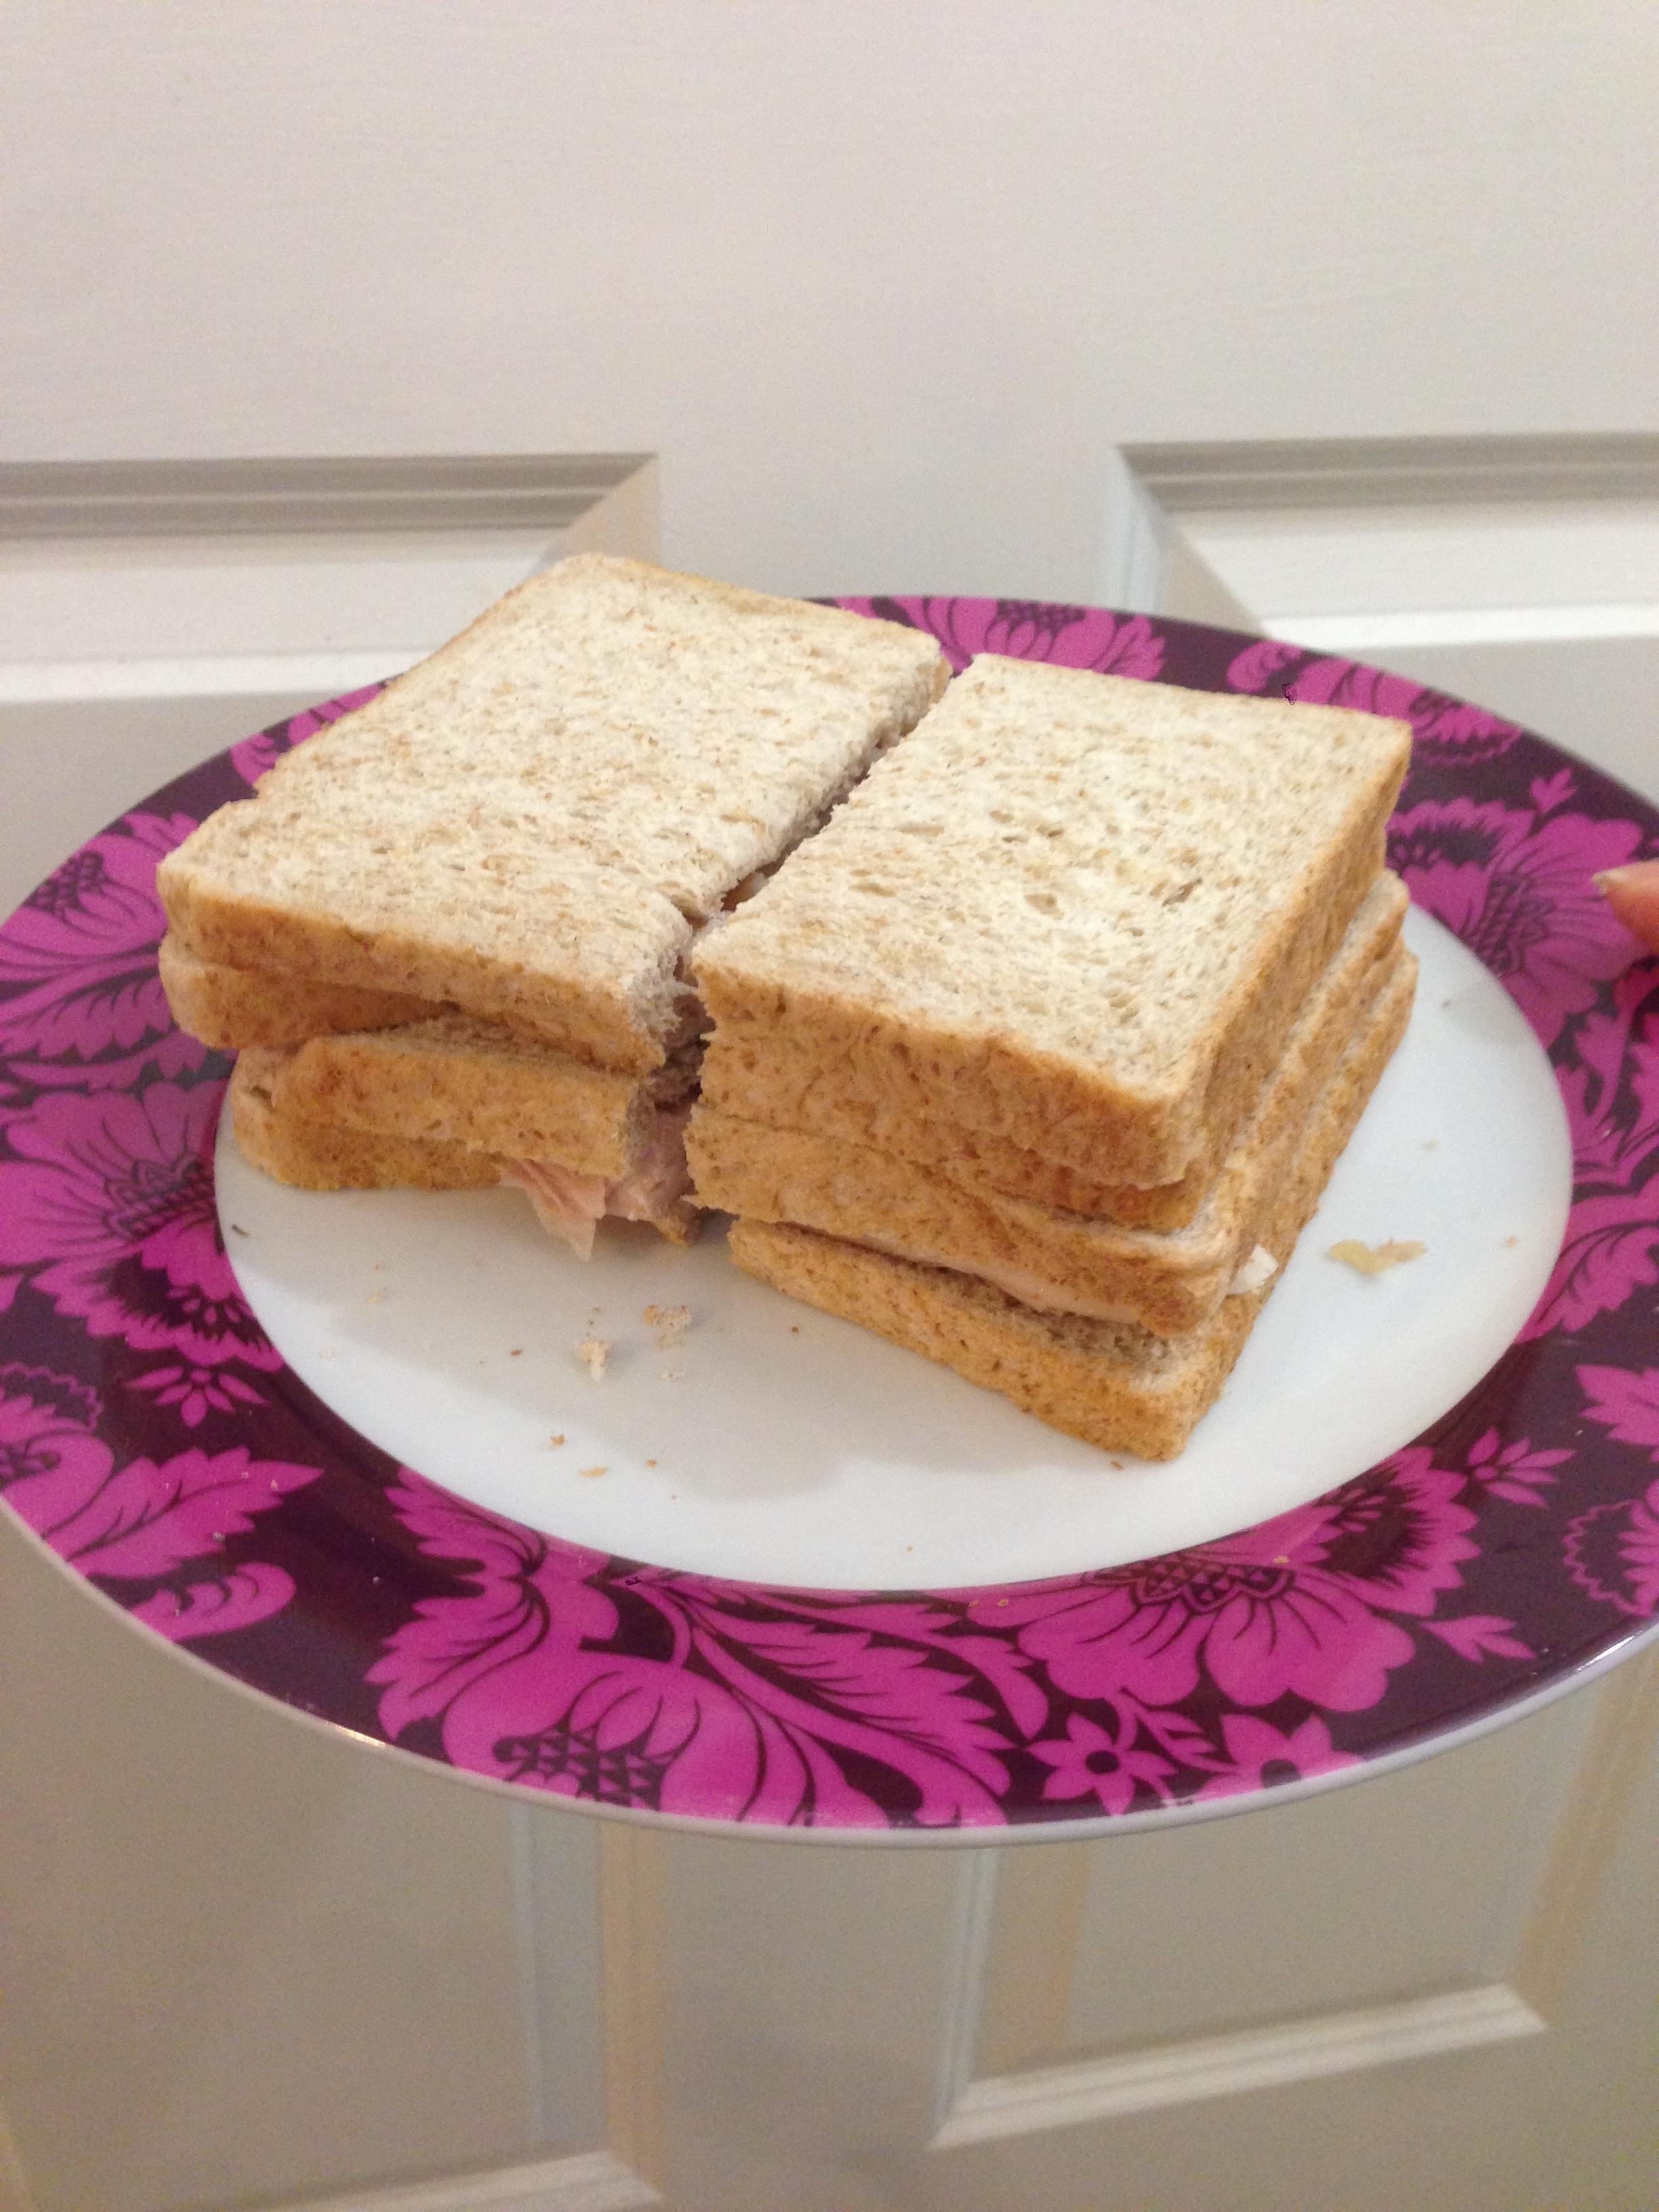 #BEDM Day 11: It's British Sandwich Week Apparently